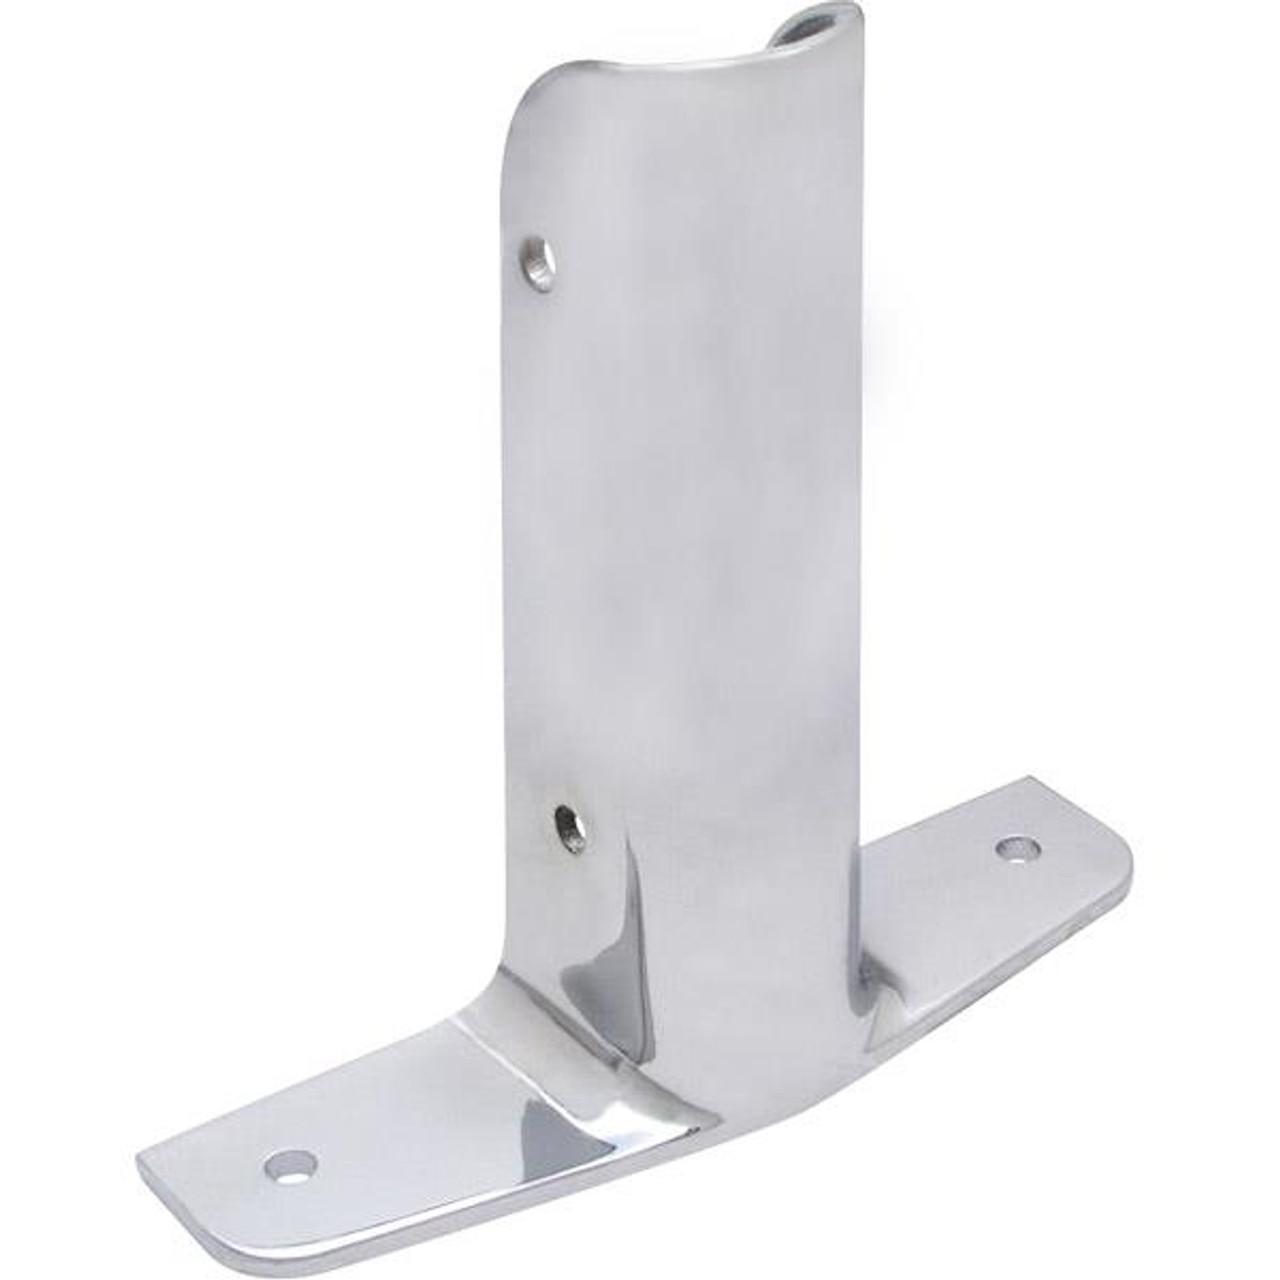 "5100 Urinal Screen Bracket 1-1/4"" X 6"" (Wing Bracket)"